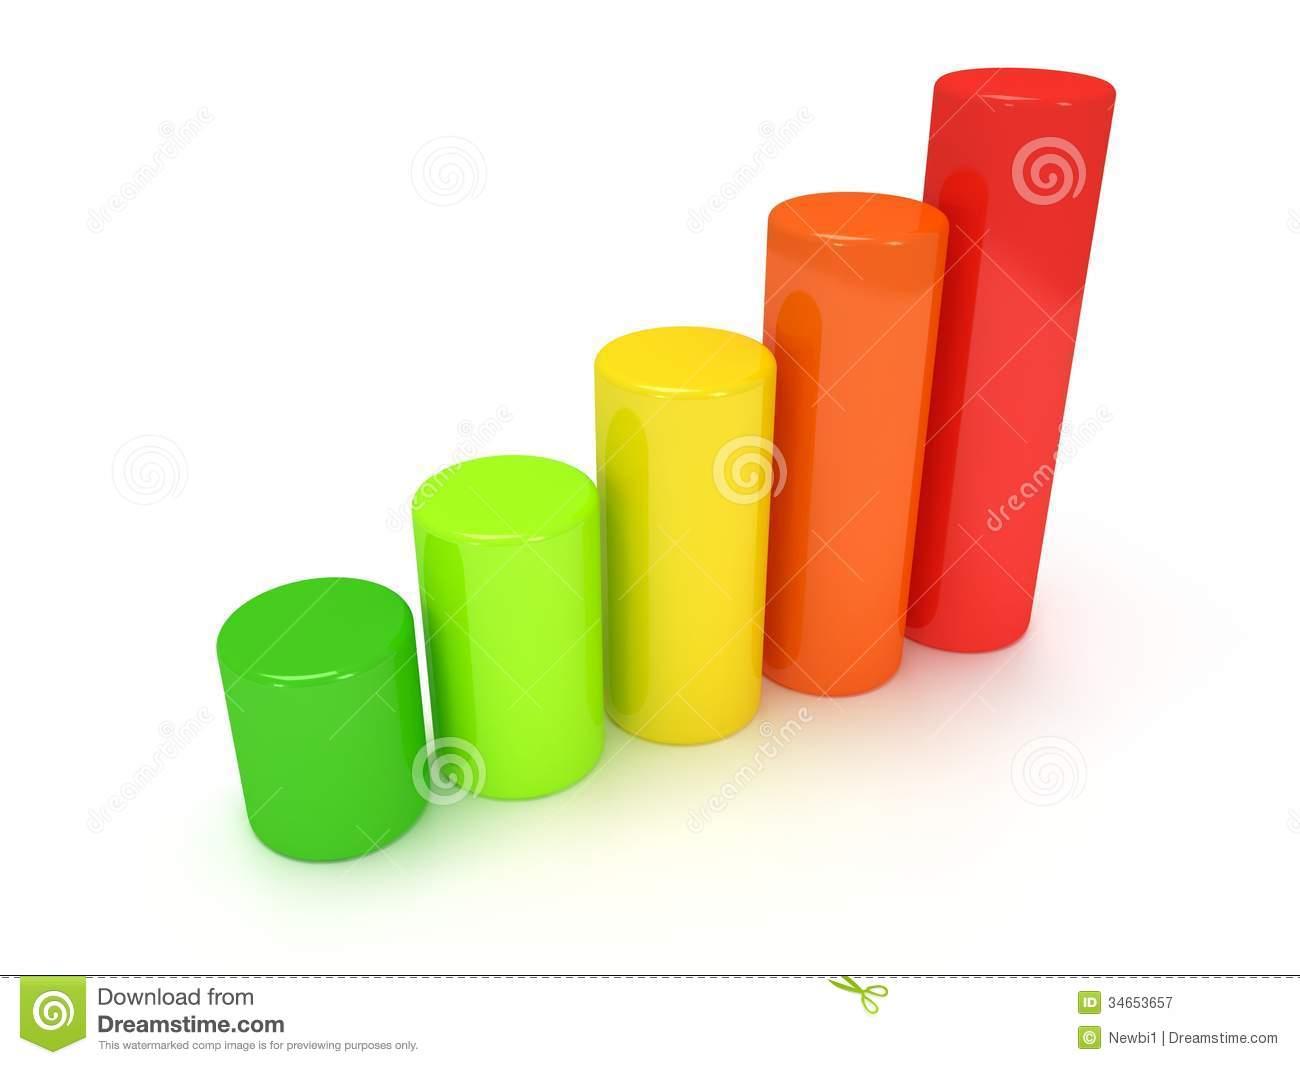 http://thumbs.dreamstime.com/z/%D1%81%D1%82%D0%BE-%D0%B1%D1%87%D0%B0%D1%82%D0%B0%D1%8F-%D0%B8%D0%B0%D0%B3%D1%80%D0%B0%D0%BC%D0%BC%D0%B0-%D0%BF%D0%BE%D0%BA%D1%80%D0%B0%D1%88%D0%B5%D0%BD%D0%BD%D0%B0%D1%8F-d-34653657.jpg